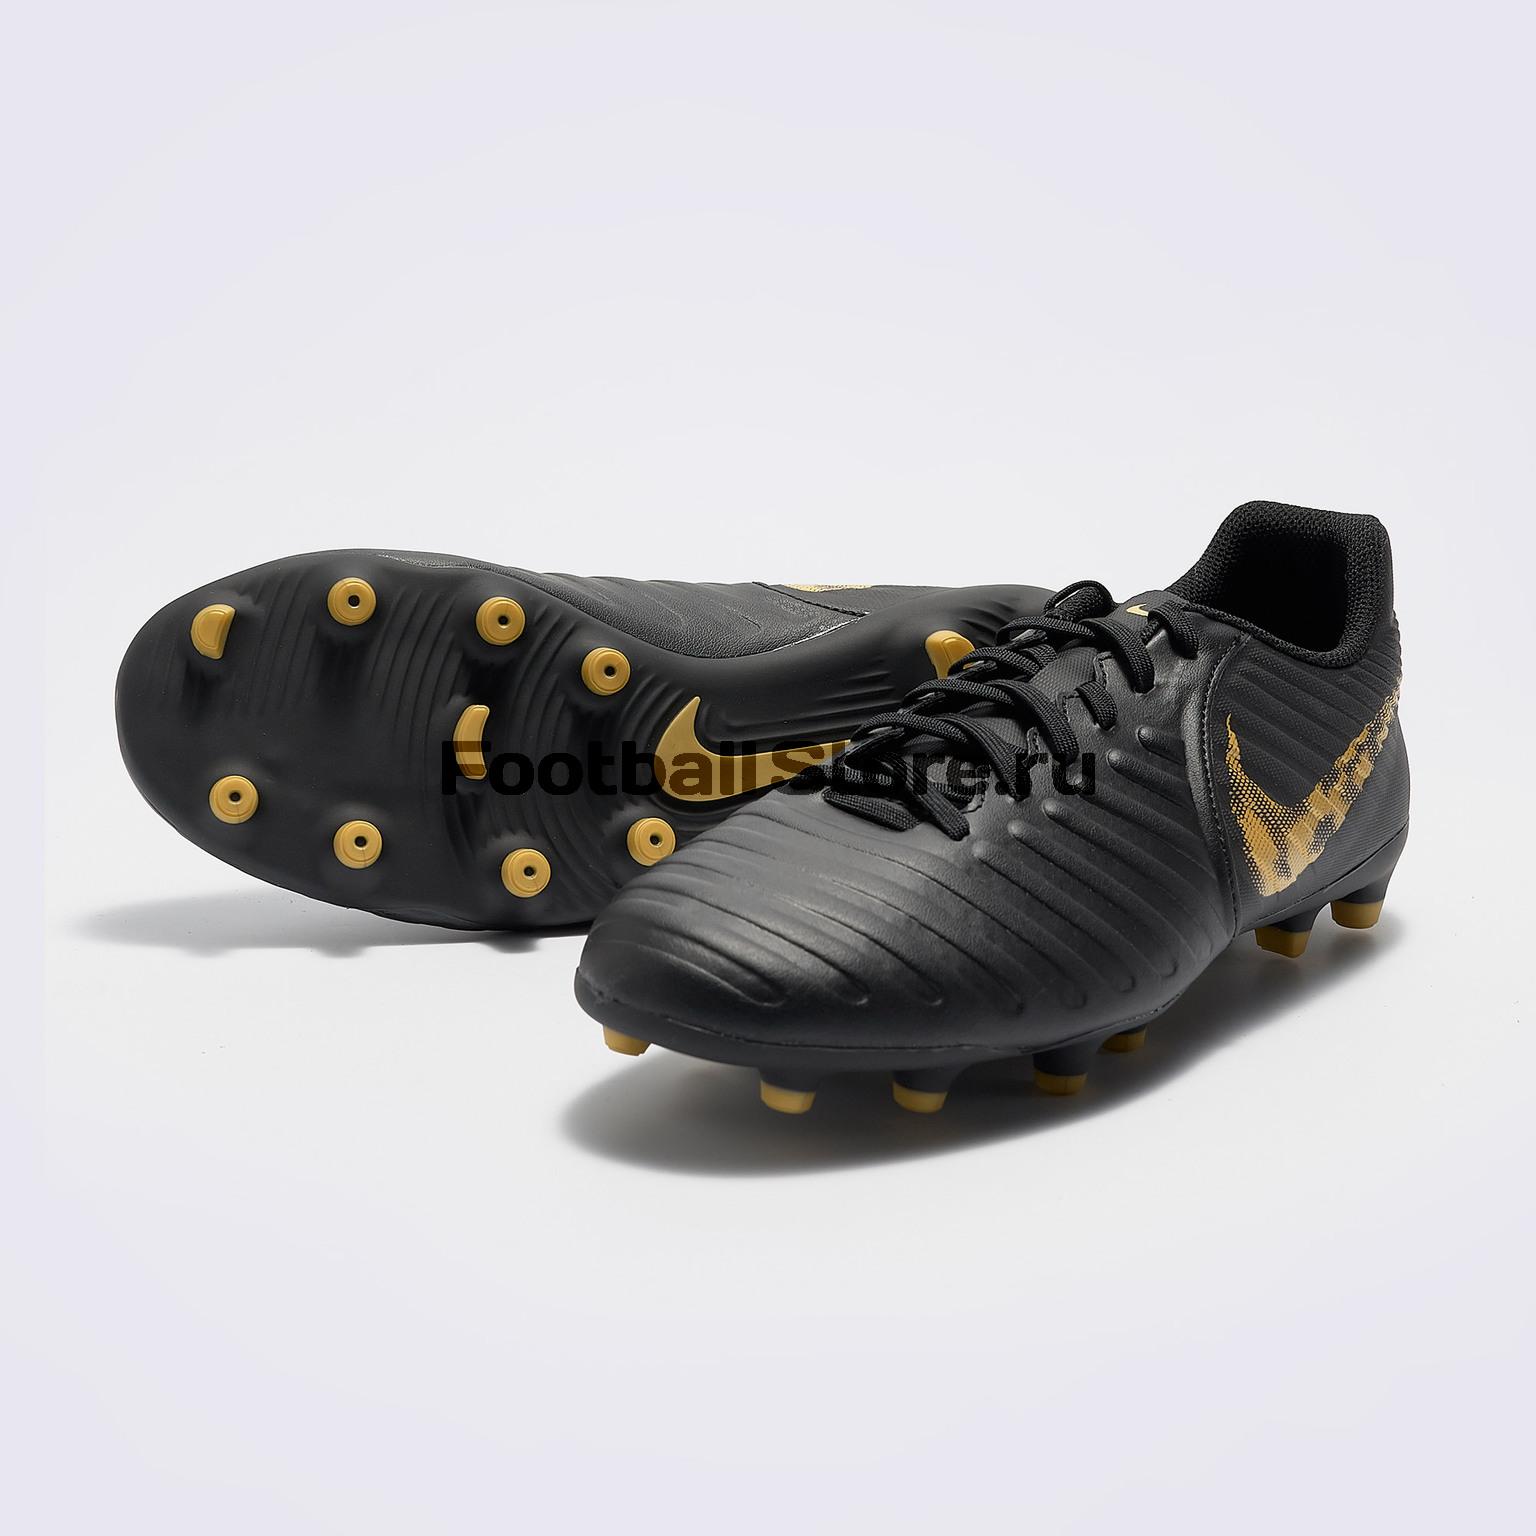 e0b37201459 Бутсы Nike Legend 7 Club FG AO2597-077 – купить бутсы в интернет ...